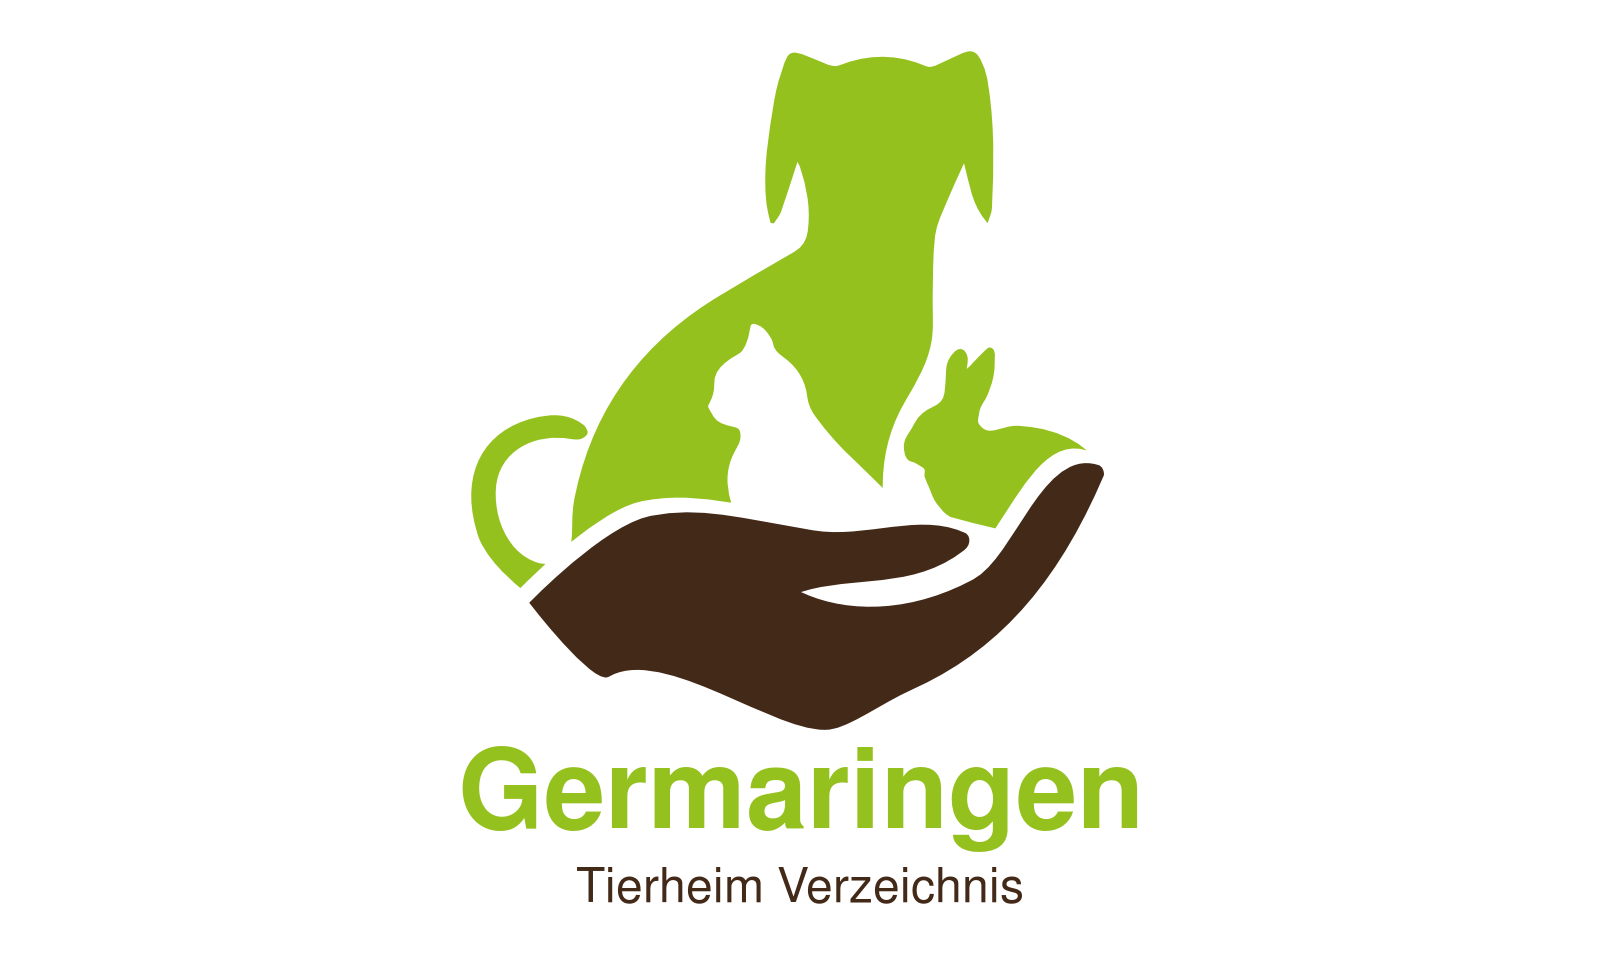 Tierheim Germaringen